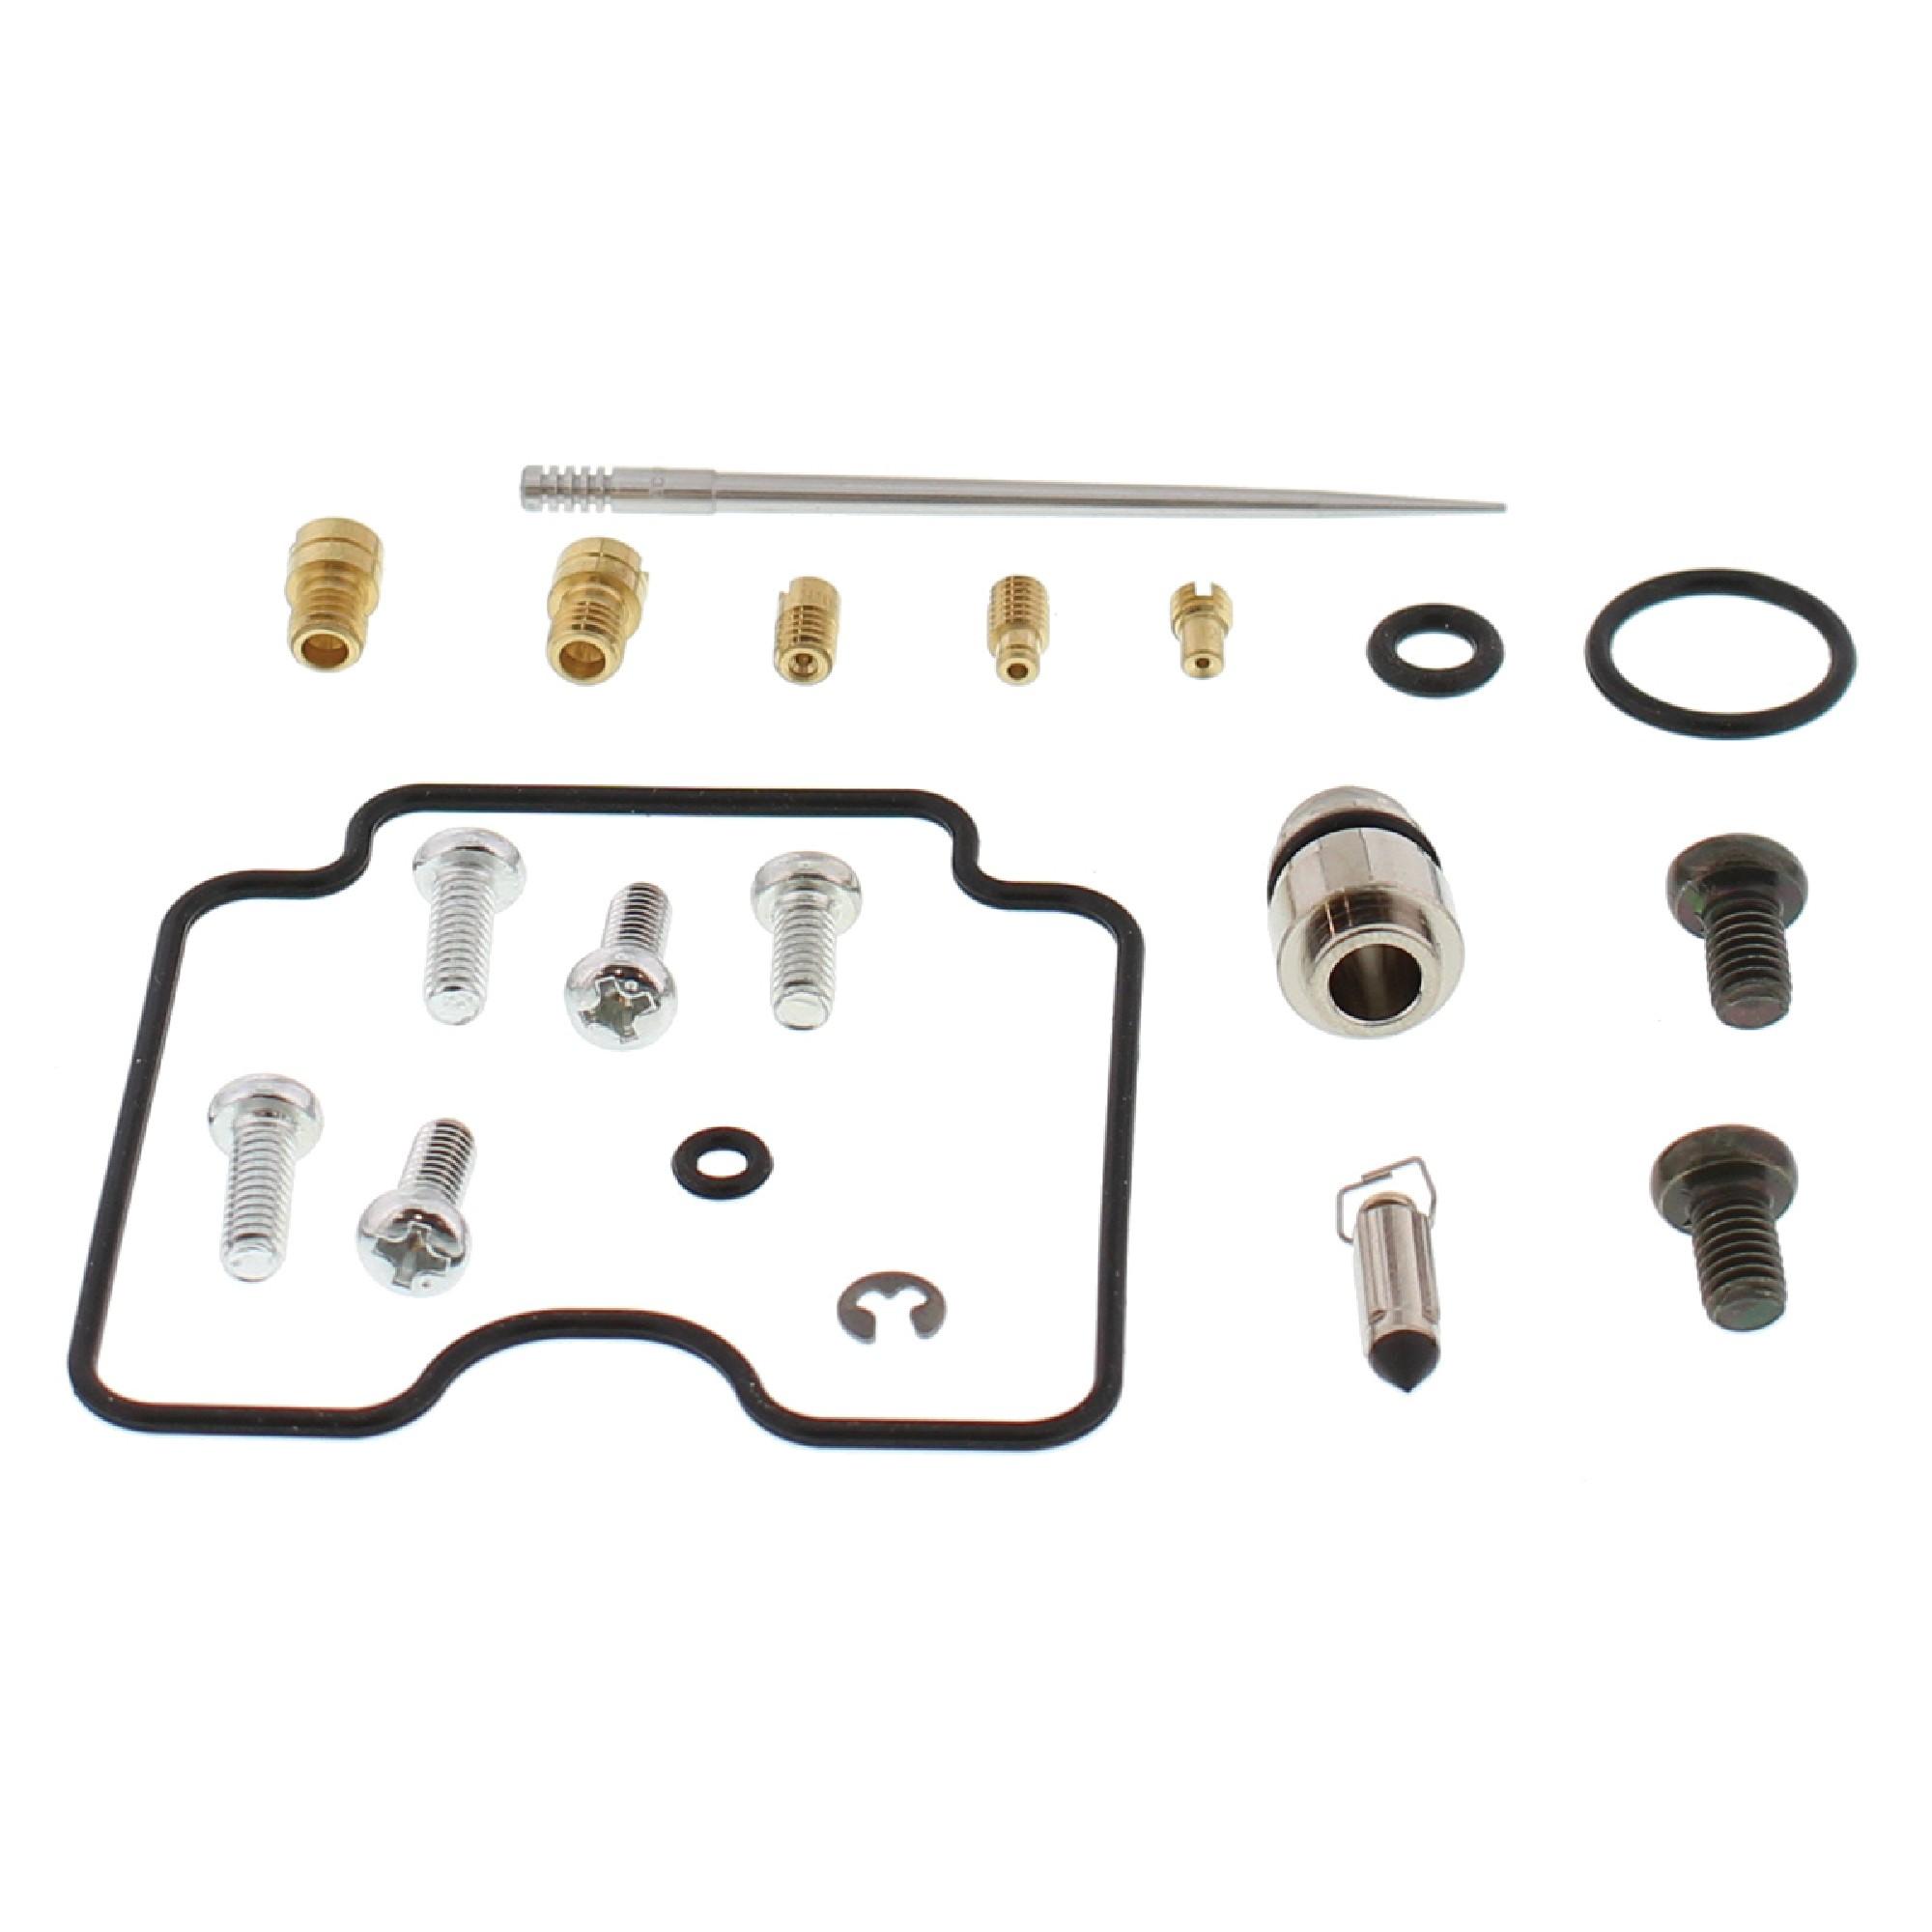 New All Balls Carburetor Rebuild Kit 26-1448 For Polaris